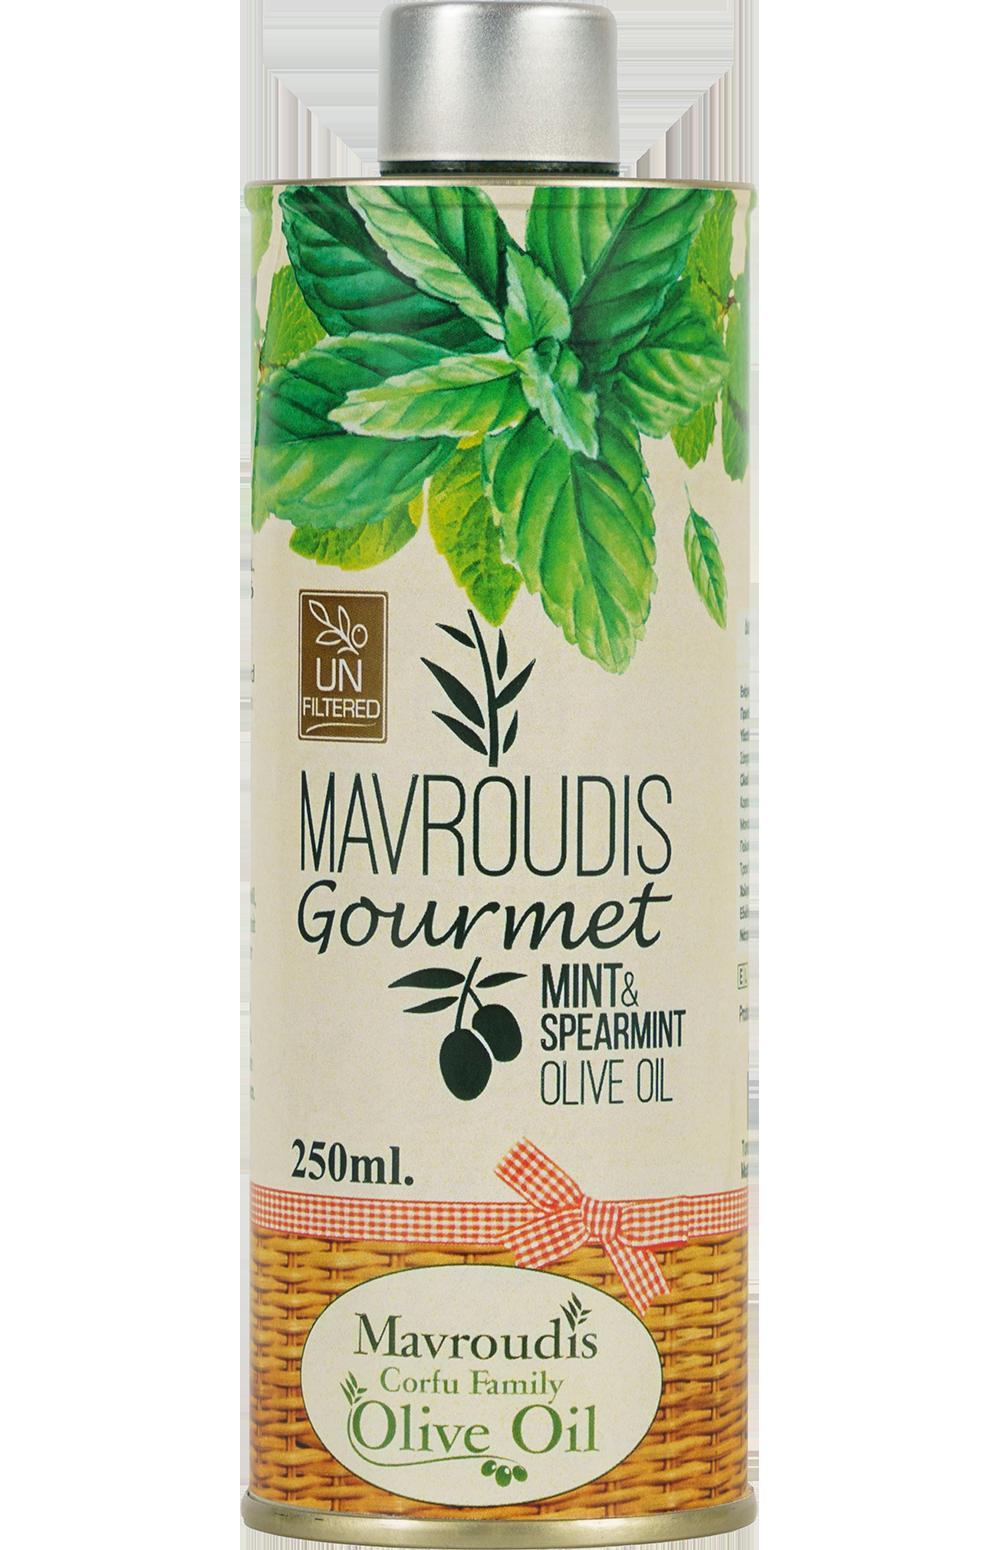 Mavroudis Gourmet Mint & Spearmint